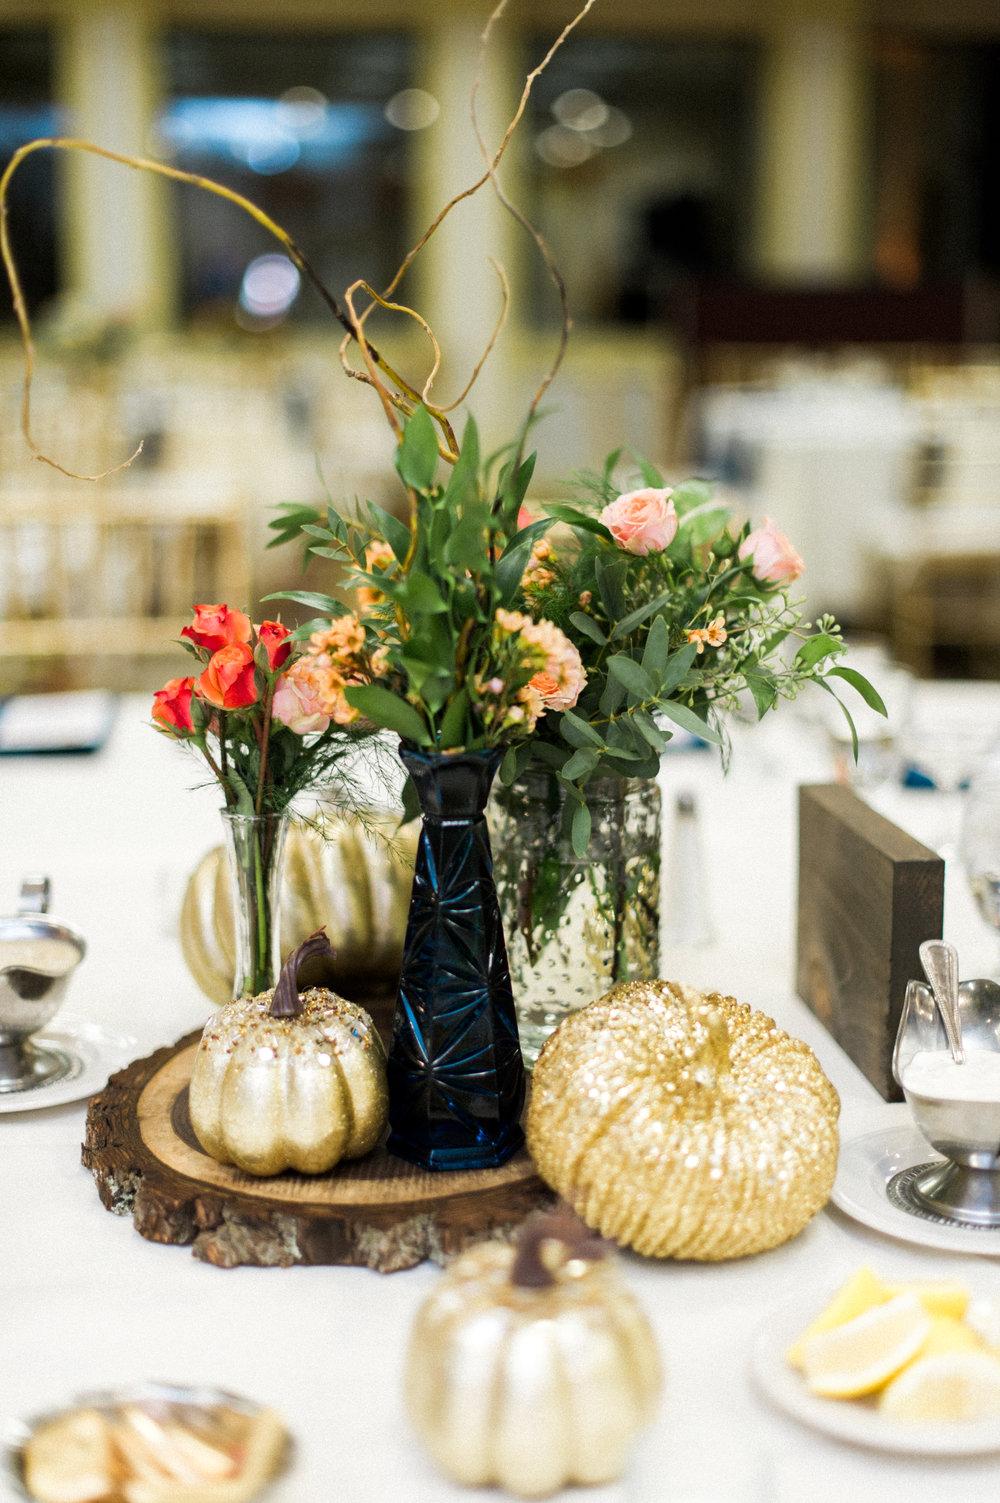 Rochester New York Wedding & Event planning